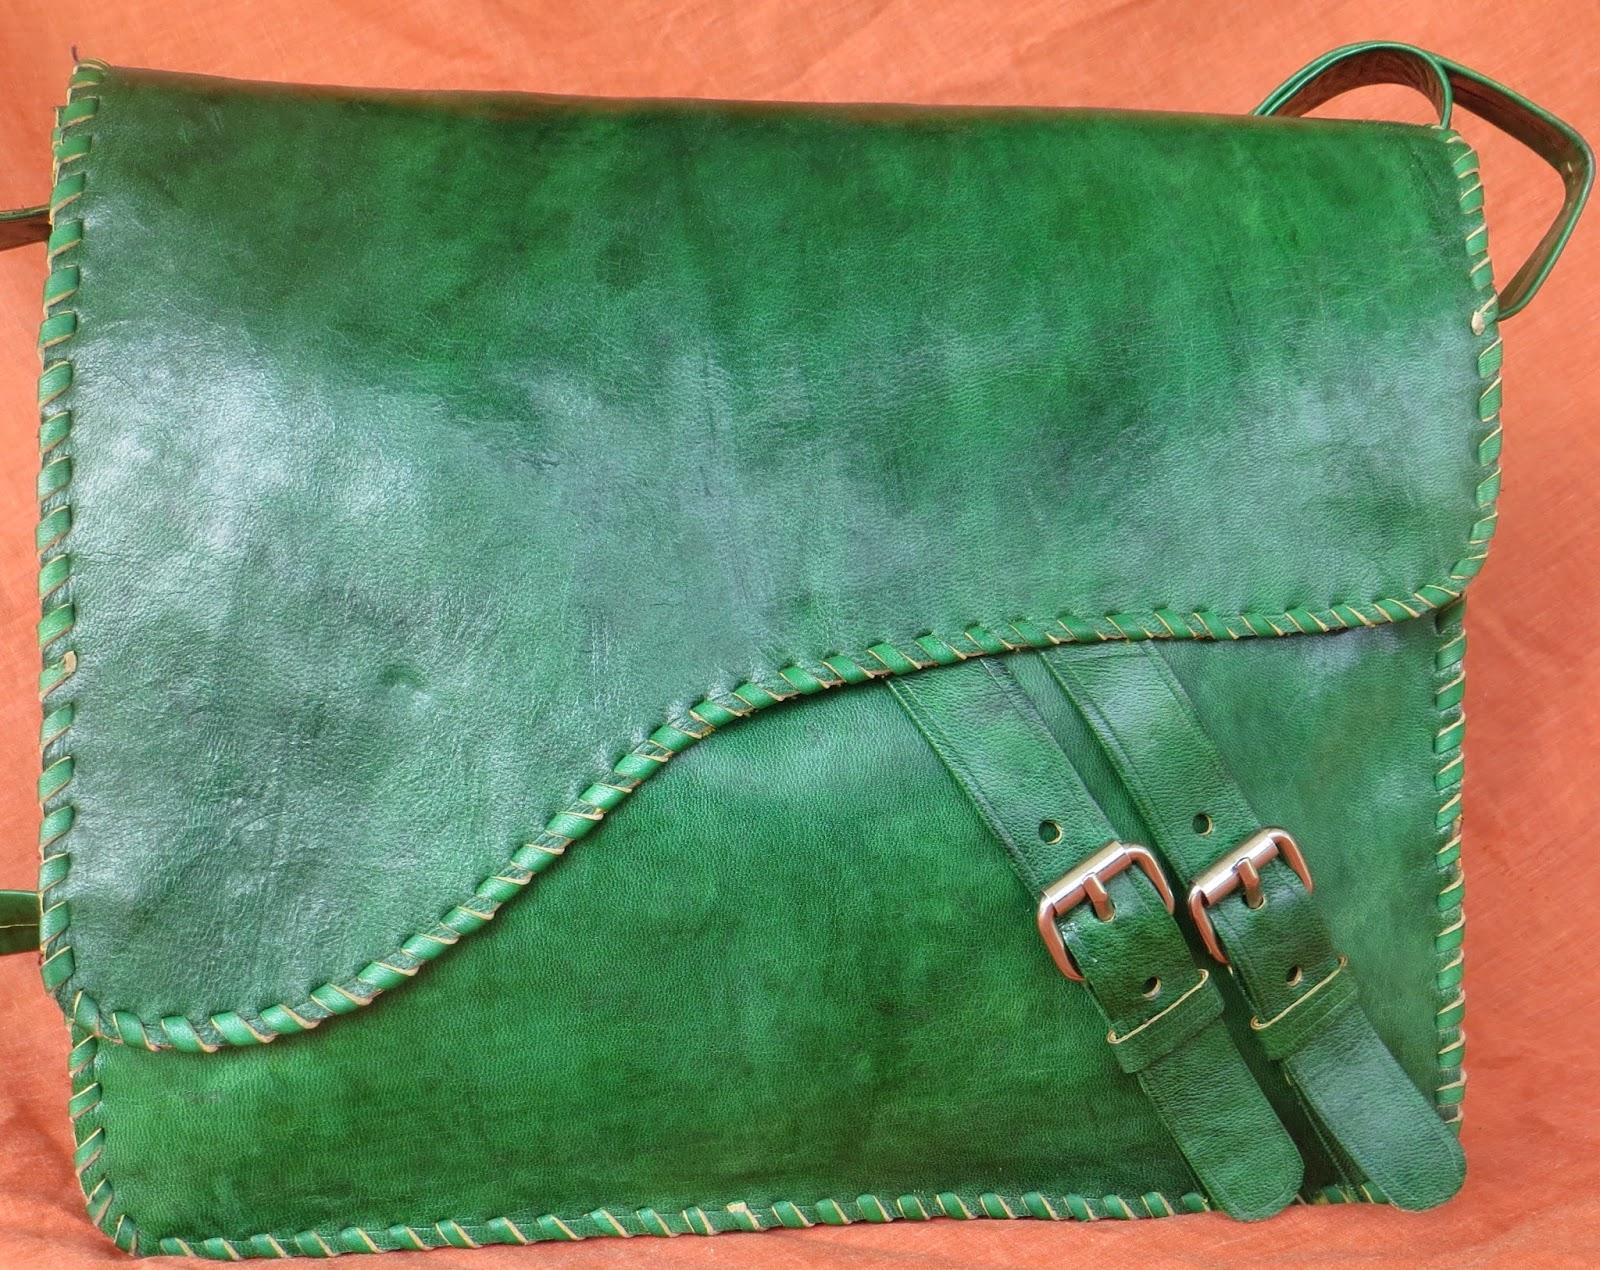 Lorma Crossbody Bag